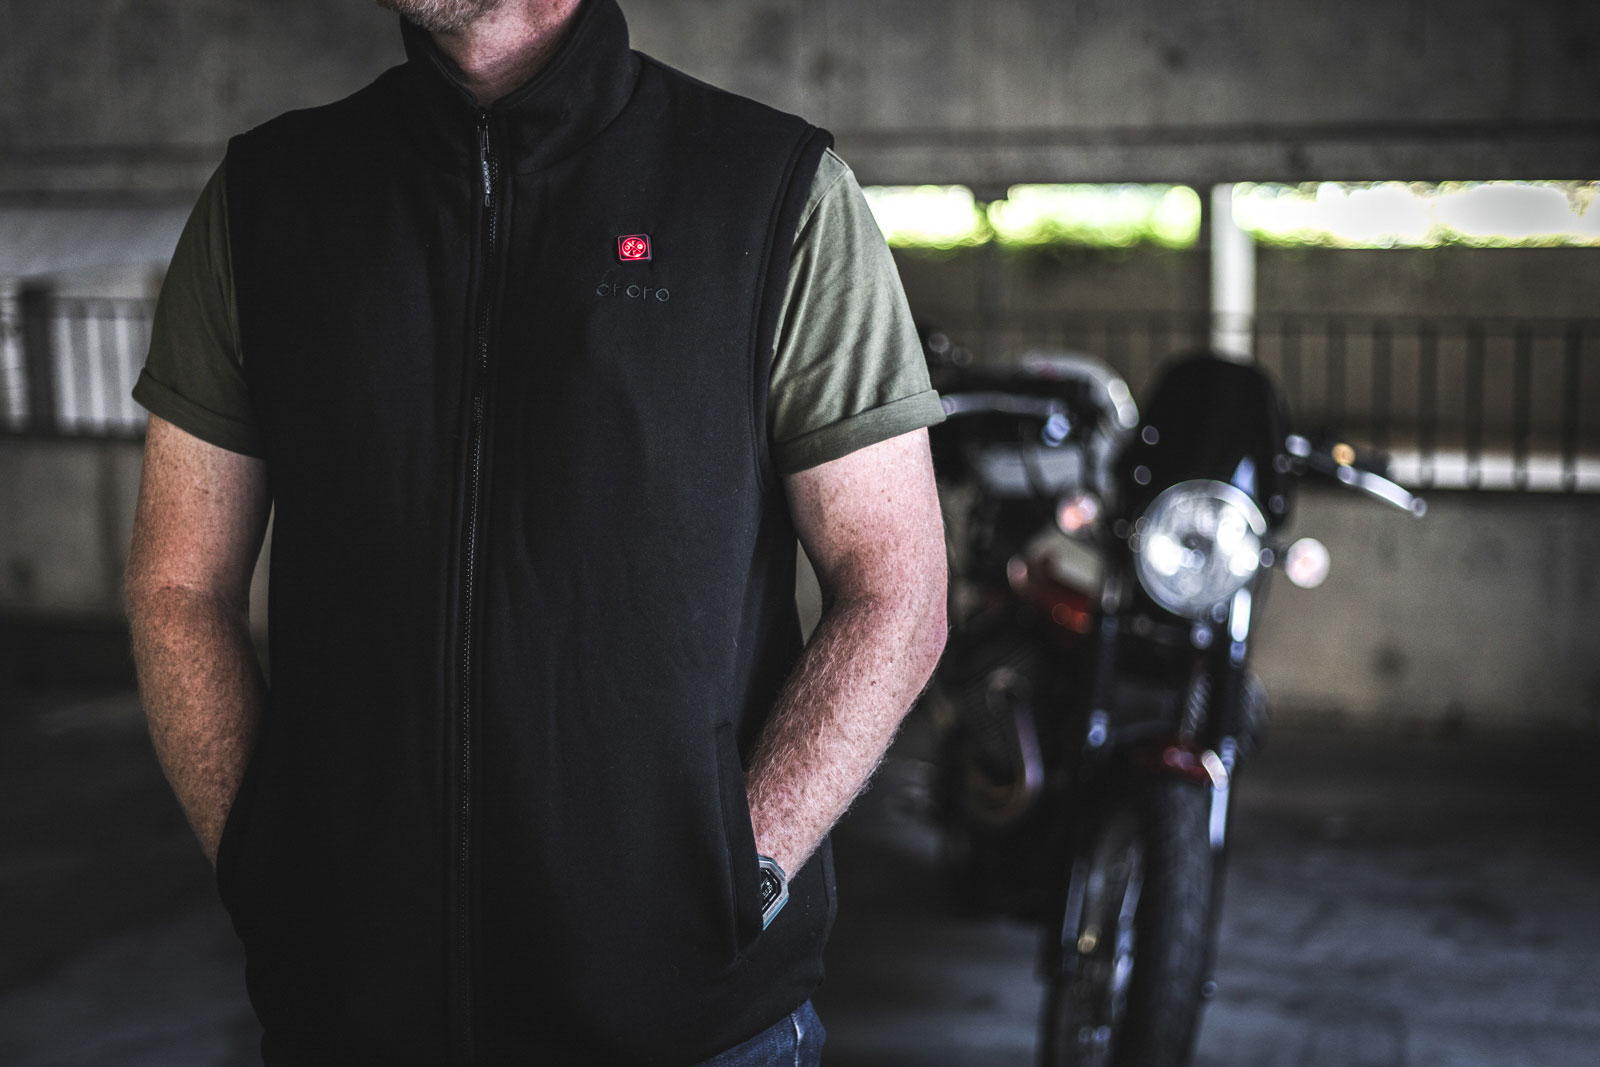 Ororo heated fleece vest